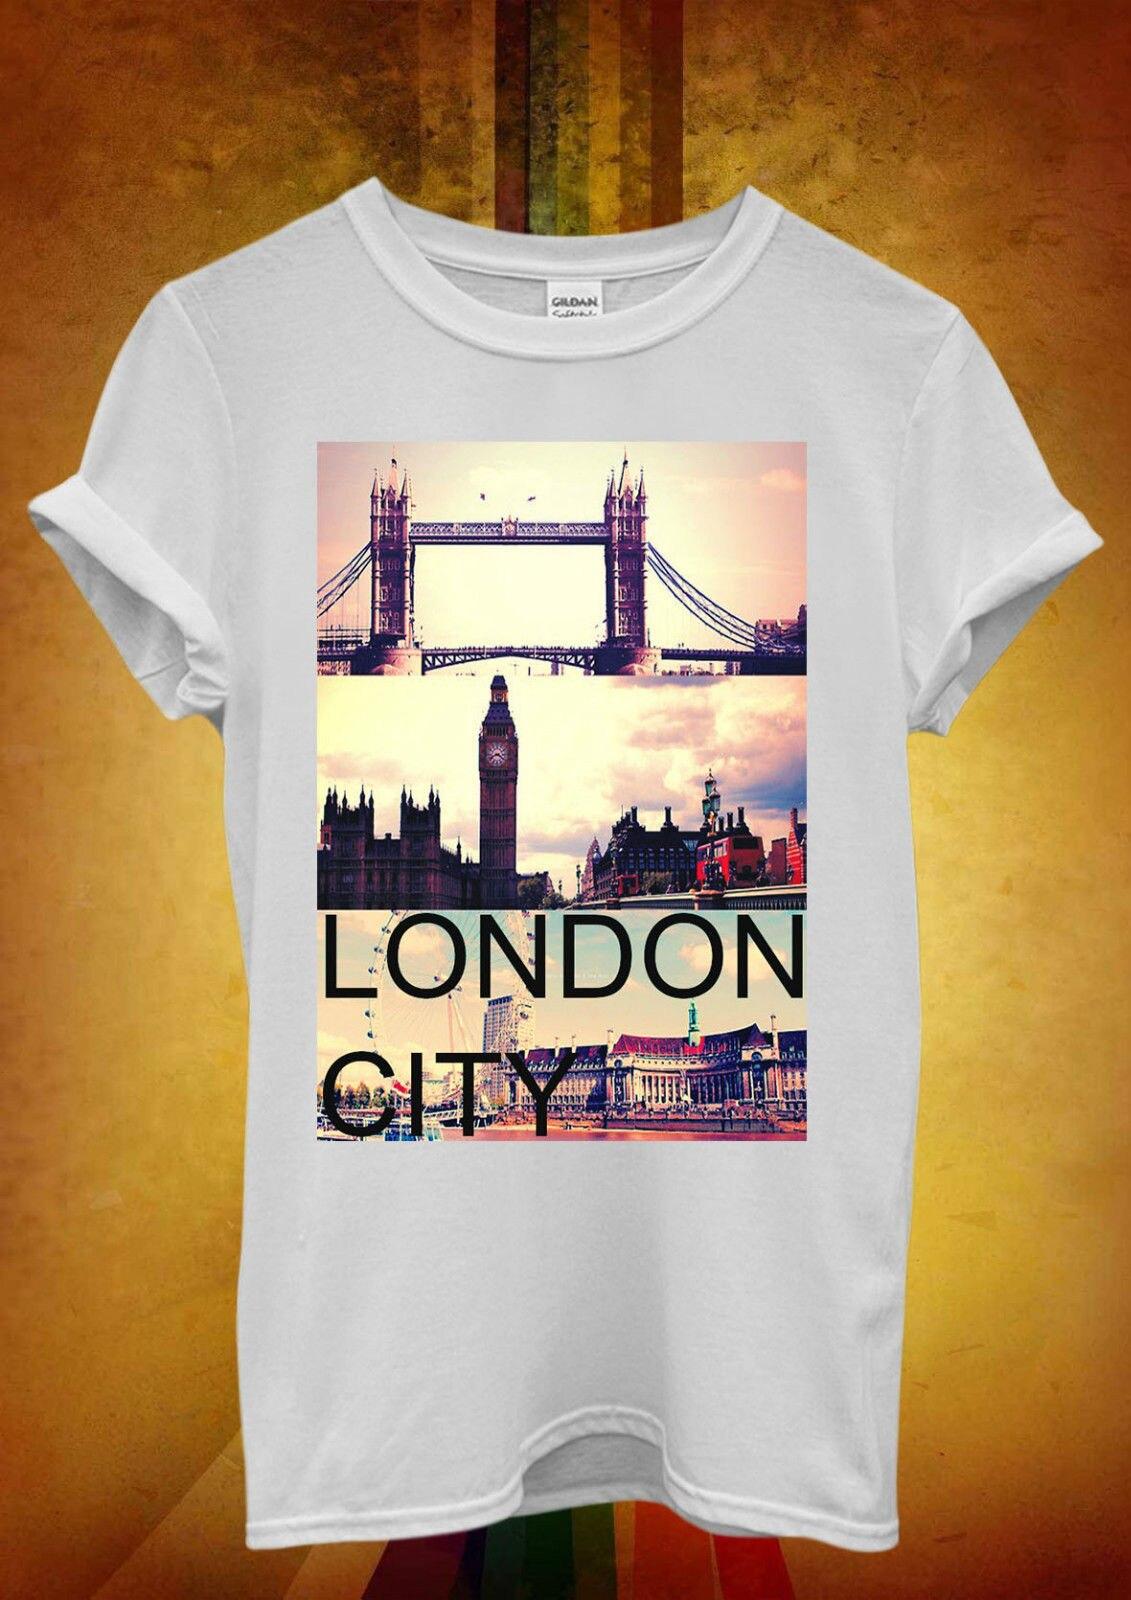 London City Big Ben Tower Bridge Men Women Unisex T Shirt   Top Vest 749 New T Shirts Funny Tops Tee New Unisex Funny Tops